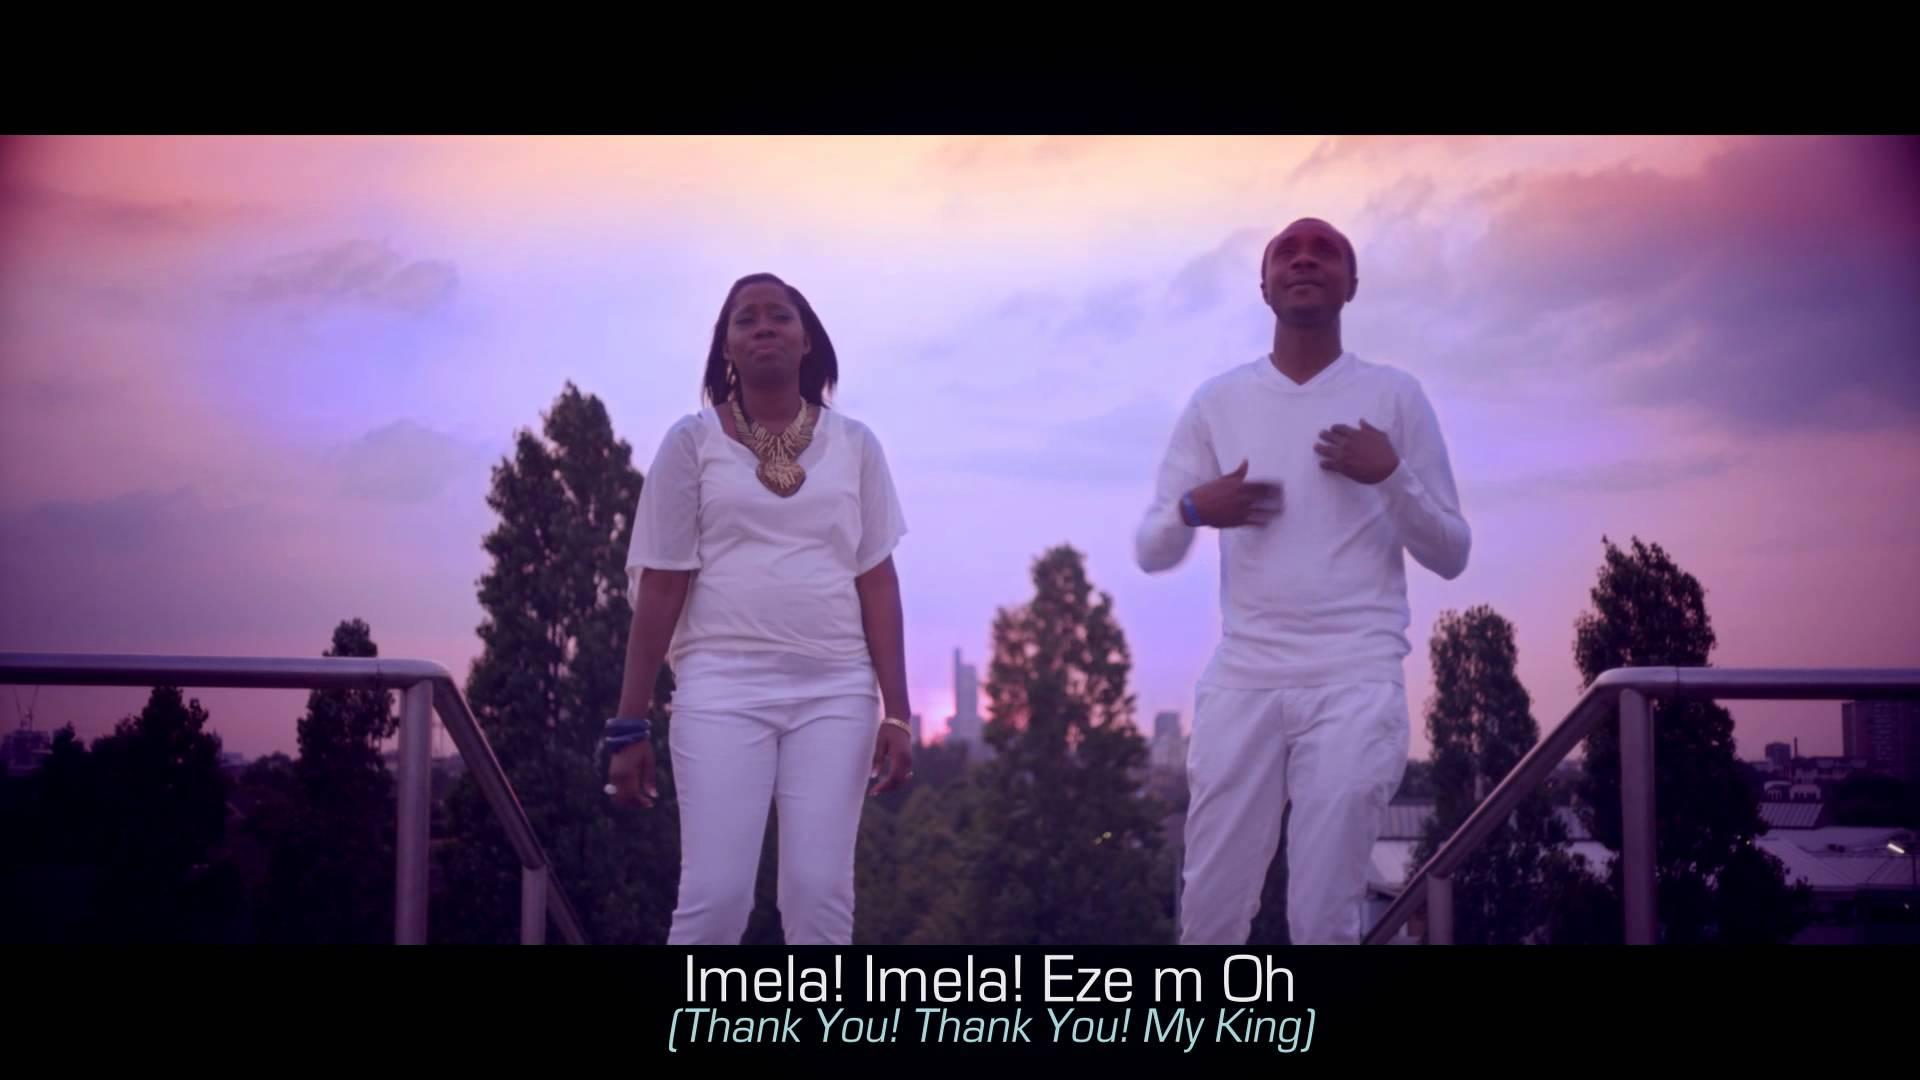 Afrikkalaisen gospelmusiikin viikko – Nathaniel Bassey feat. Enitan Adaba, Imela (Thank You)